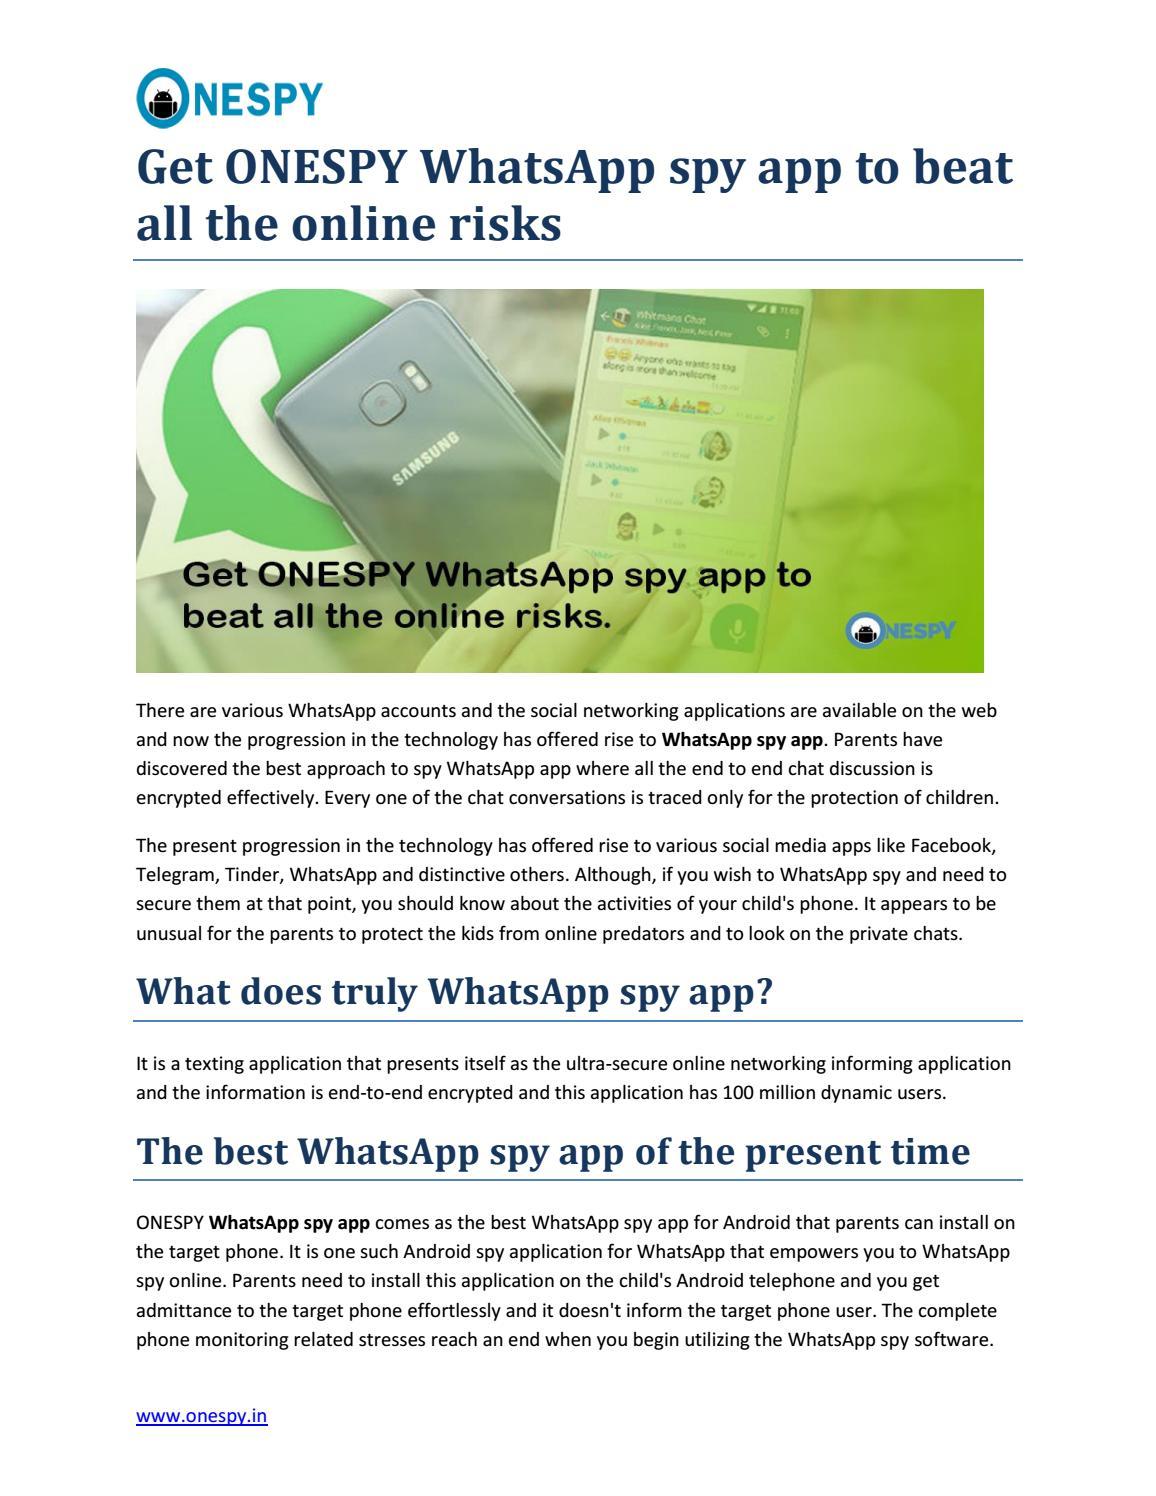 Whatsapp spy app blog 09 05 18 by Krishna Yadav - issuu